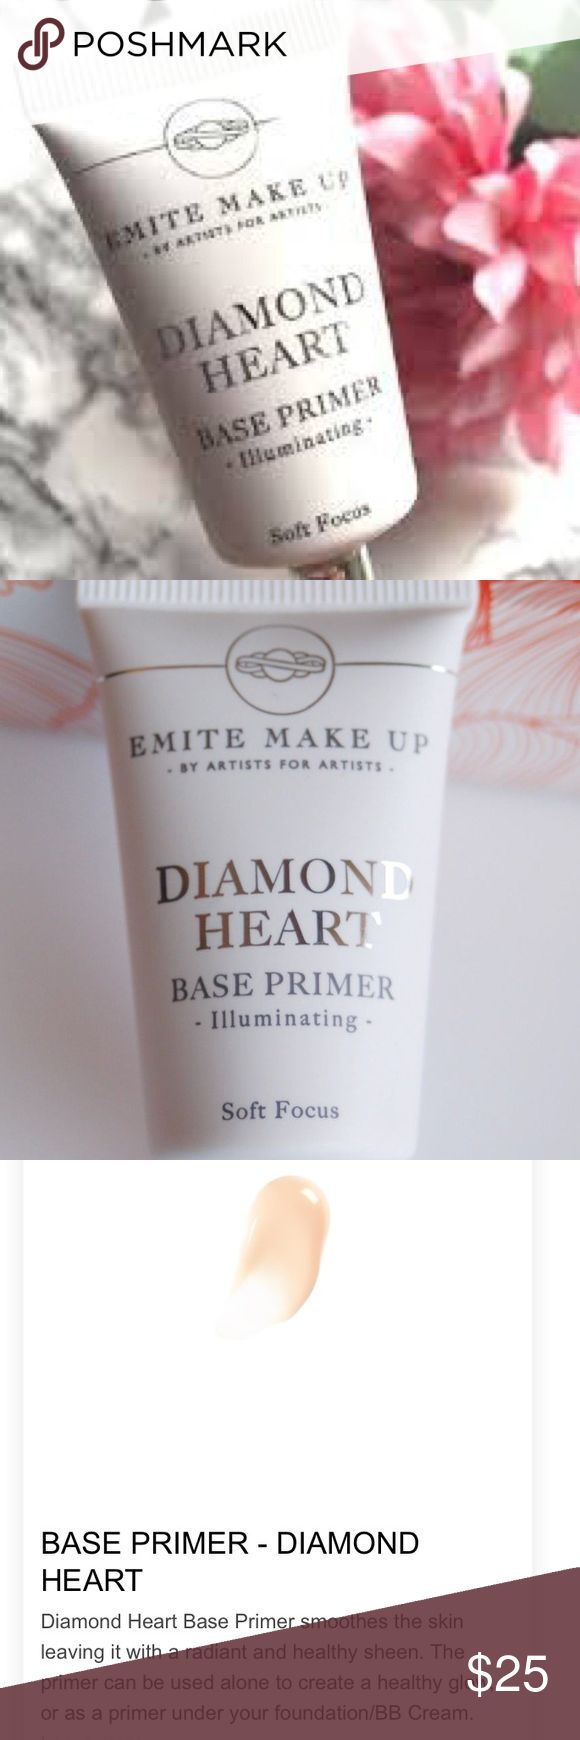 Emote make up diamond heart base primer Soft focus and illuminating Makeup Face Primer